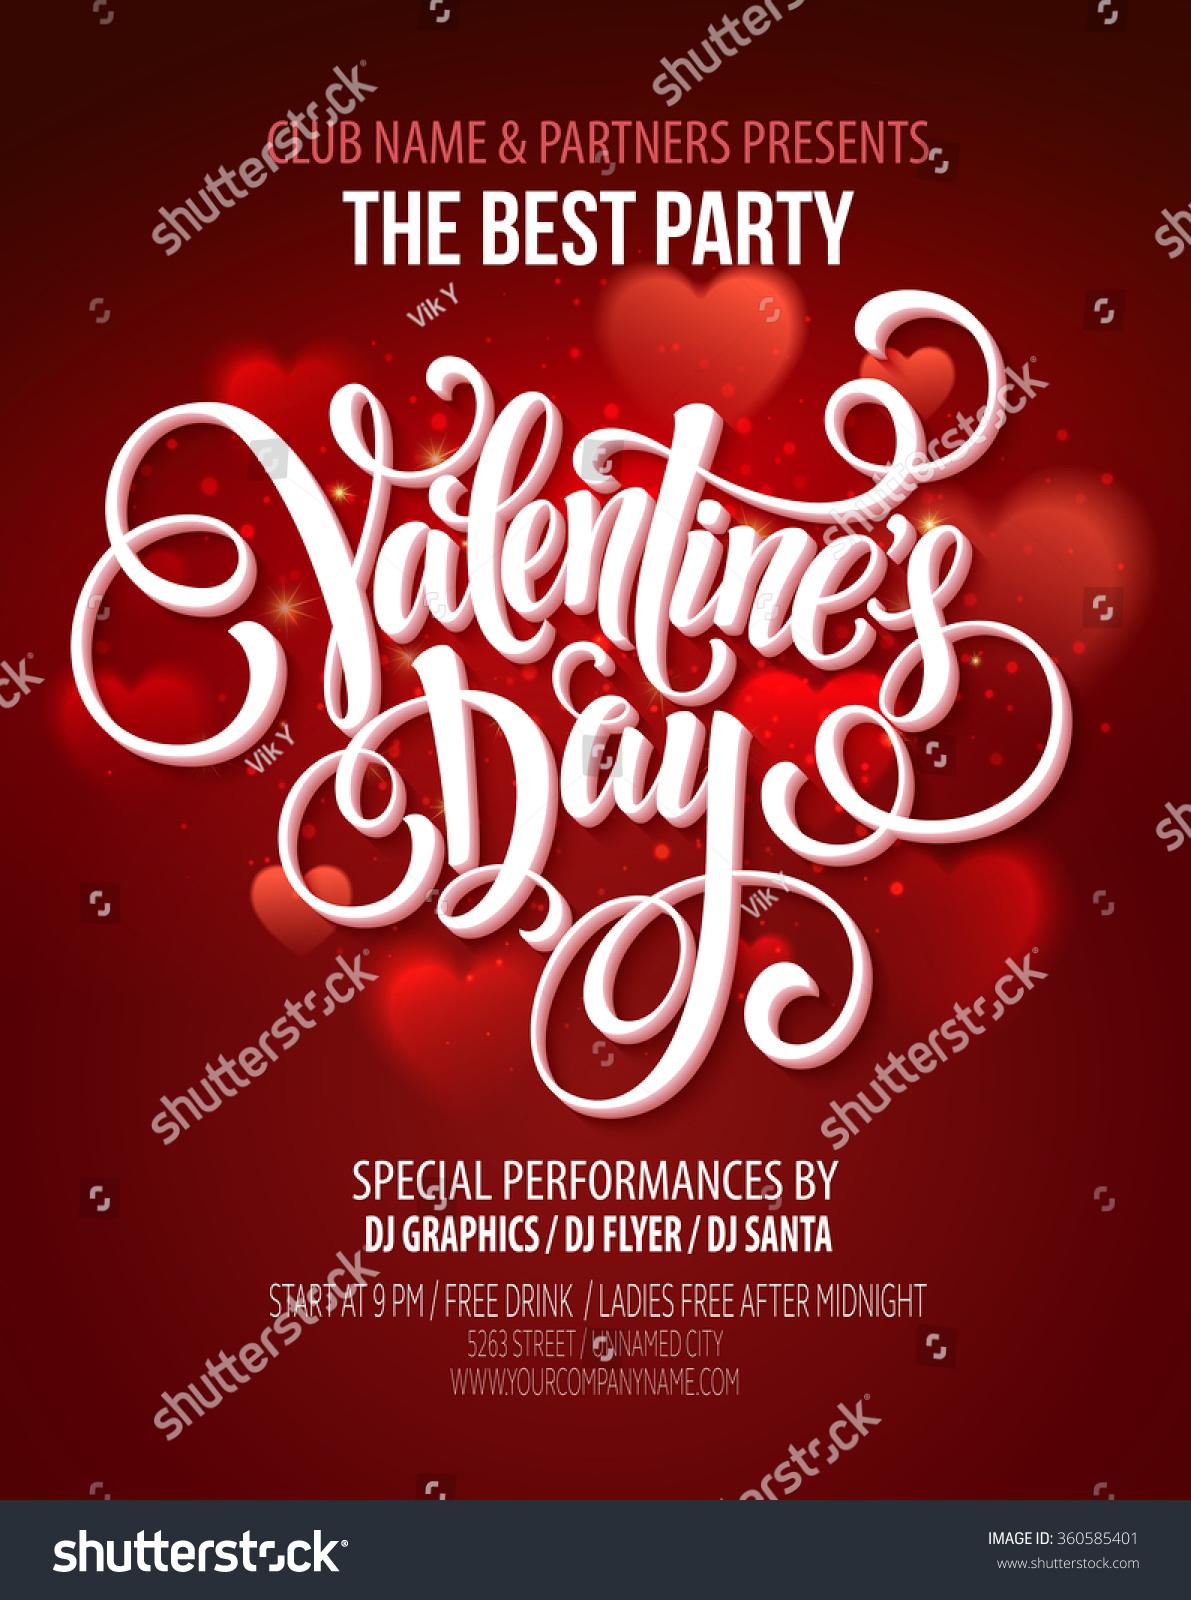 Valentines Day Party Flyer Vector Illustration Stock-Vektorgrafik ...